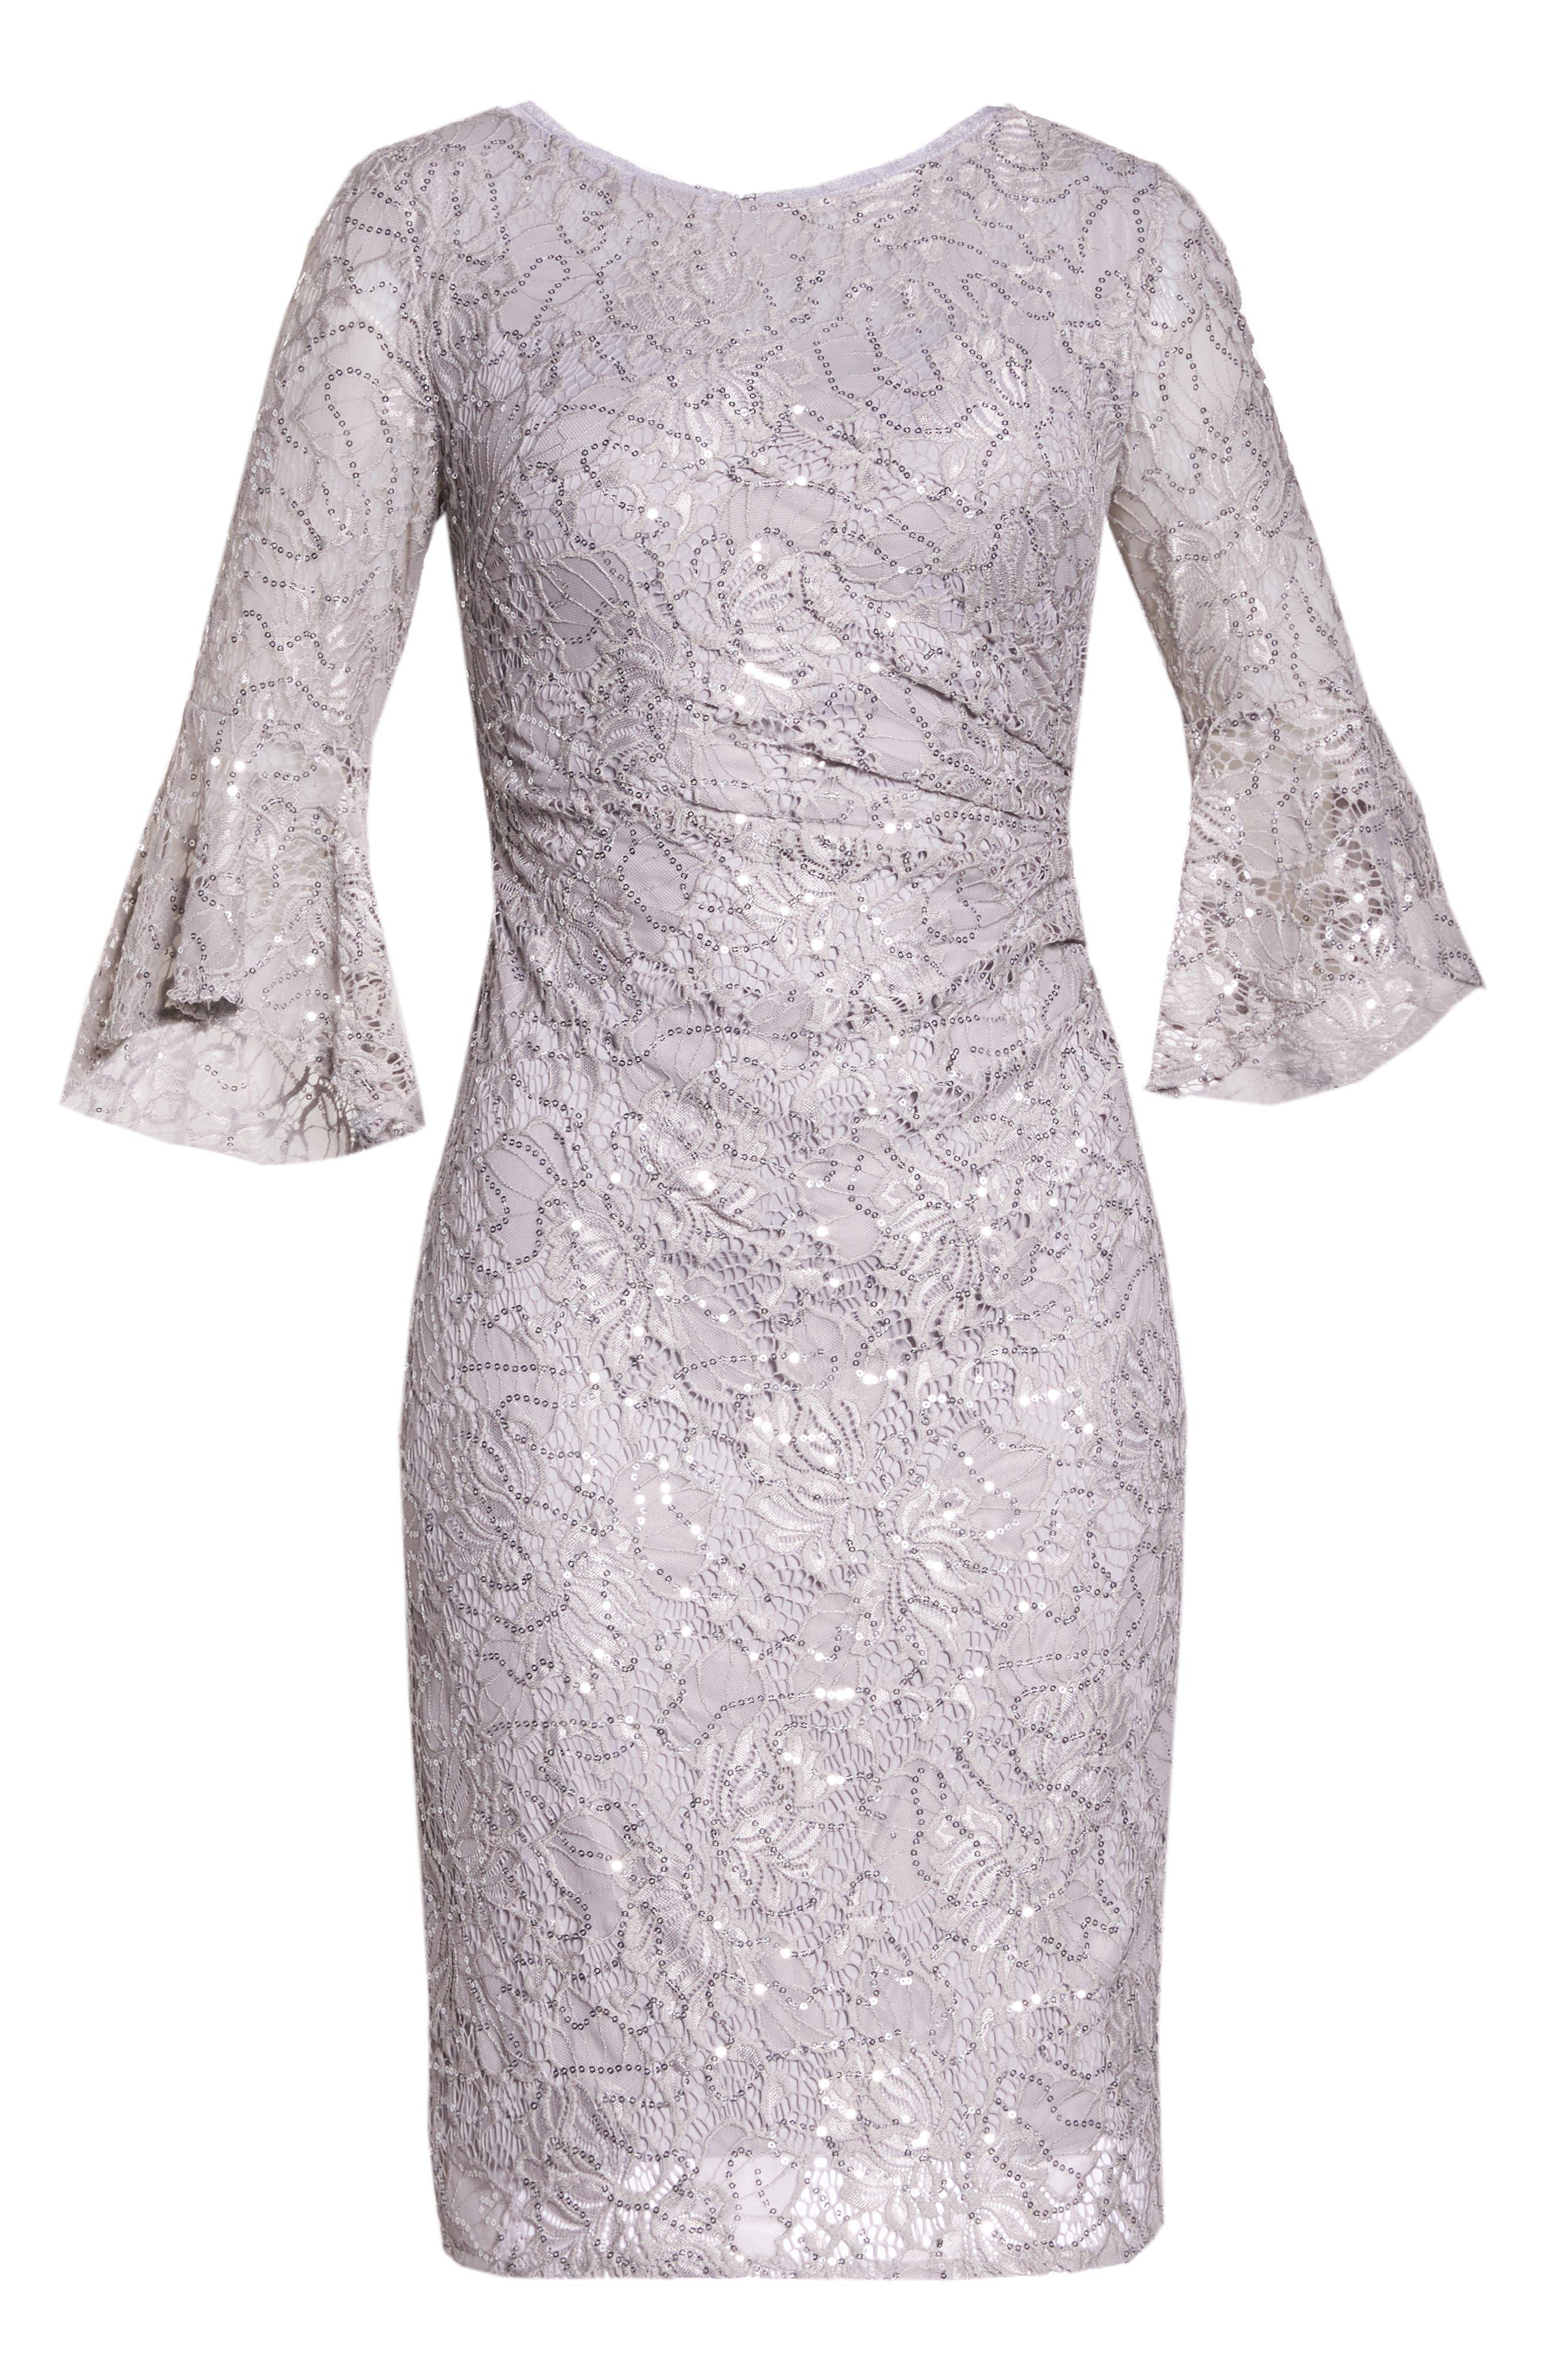 MORGAN & CO.,                             Lace Sheath Dress,                             Alternate thumbnail 7, color,                             040